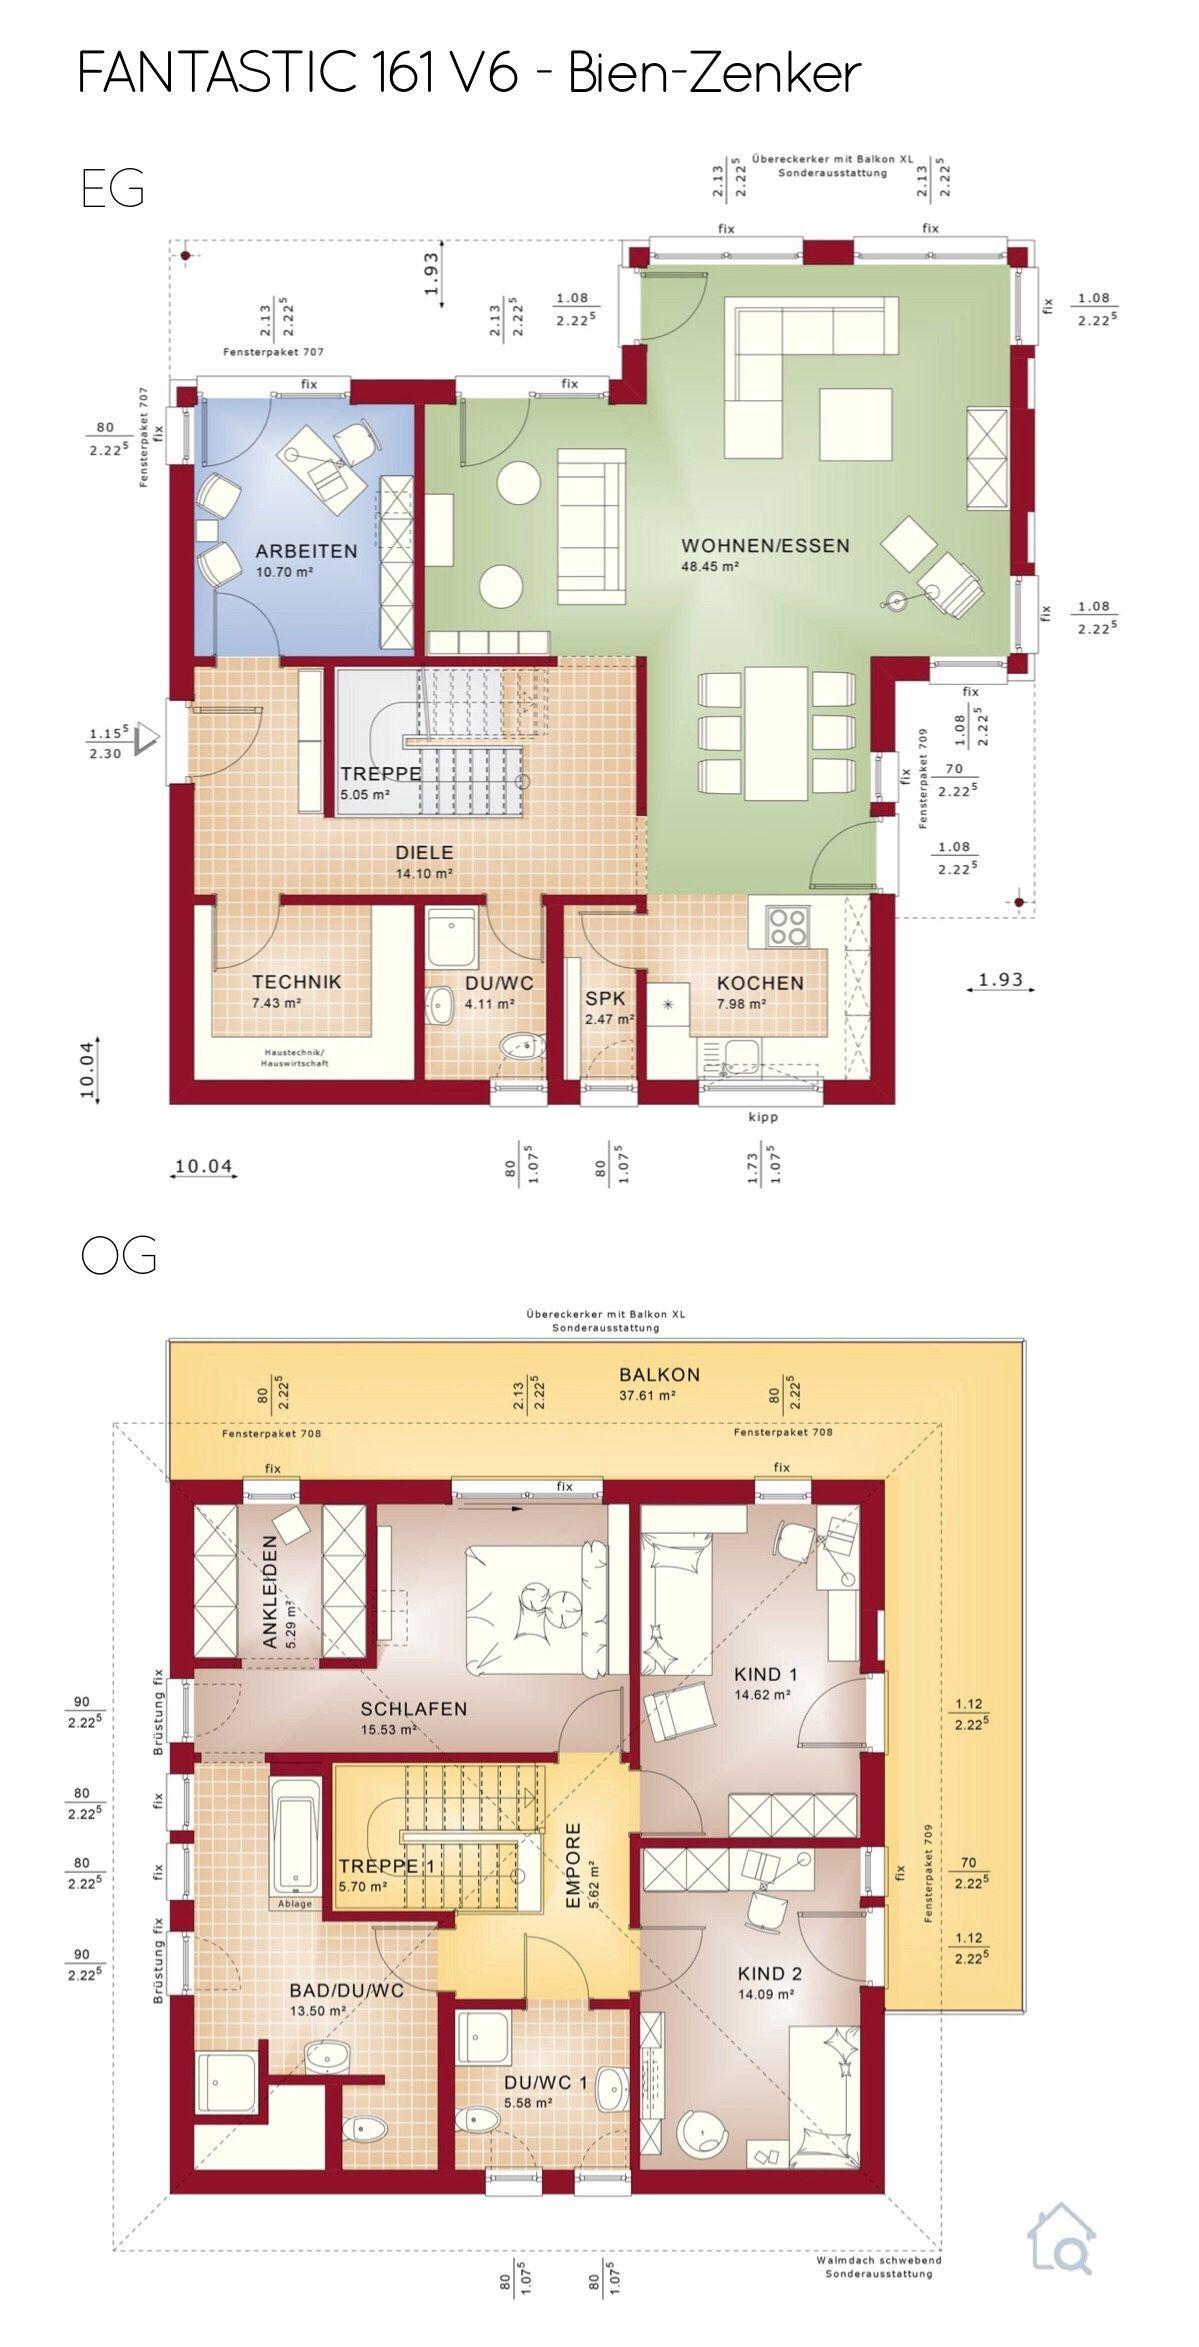 Grundriss Stadtvilla mit Erker & XL Balkon 5 Zimmer, 160